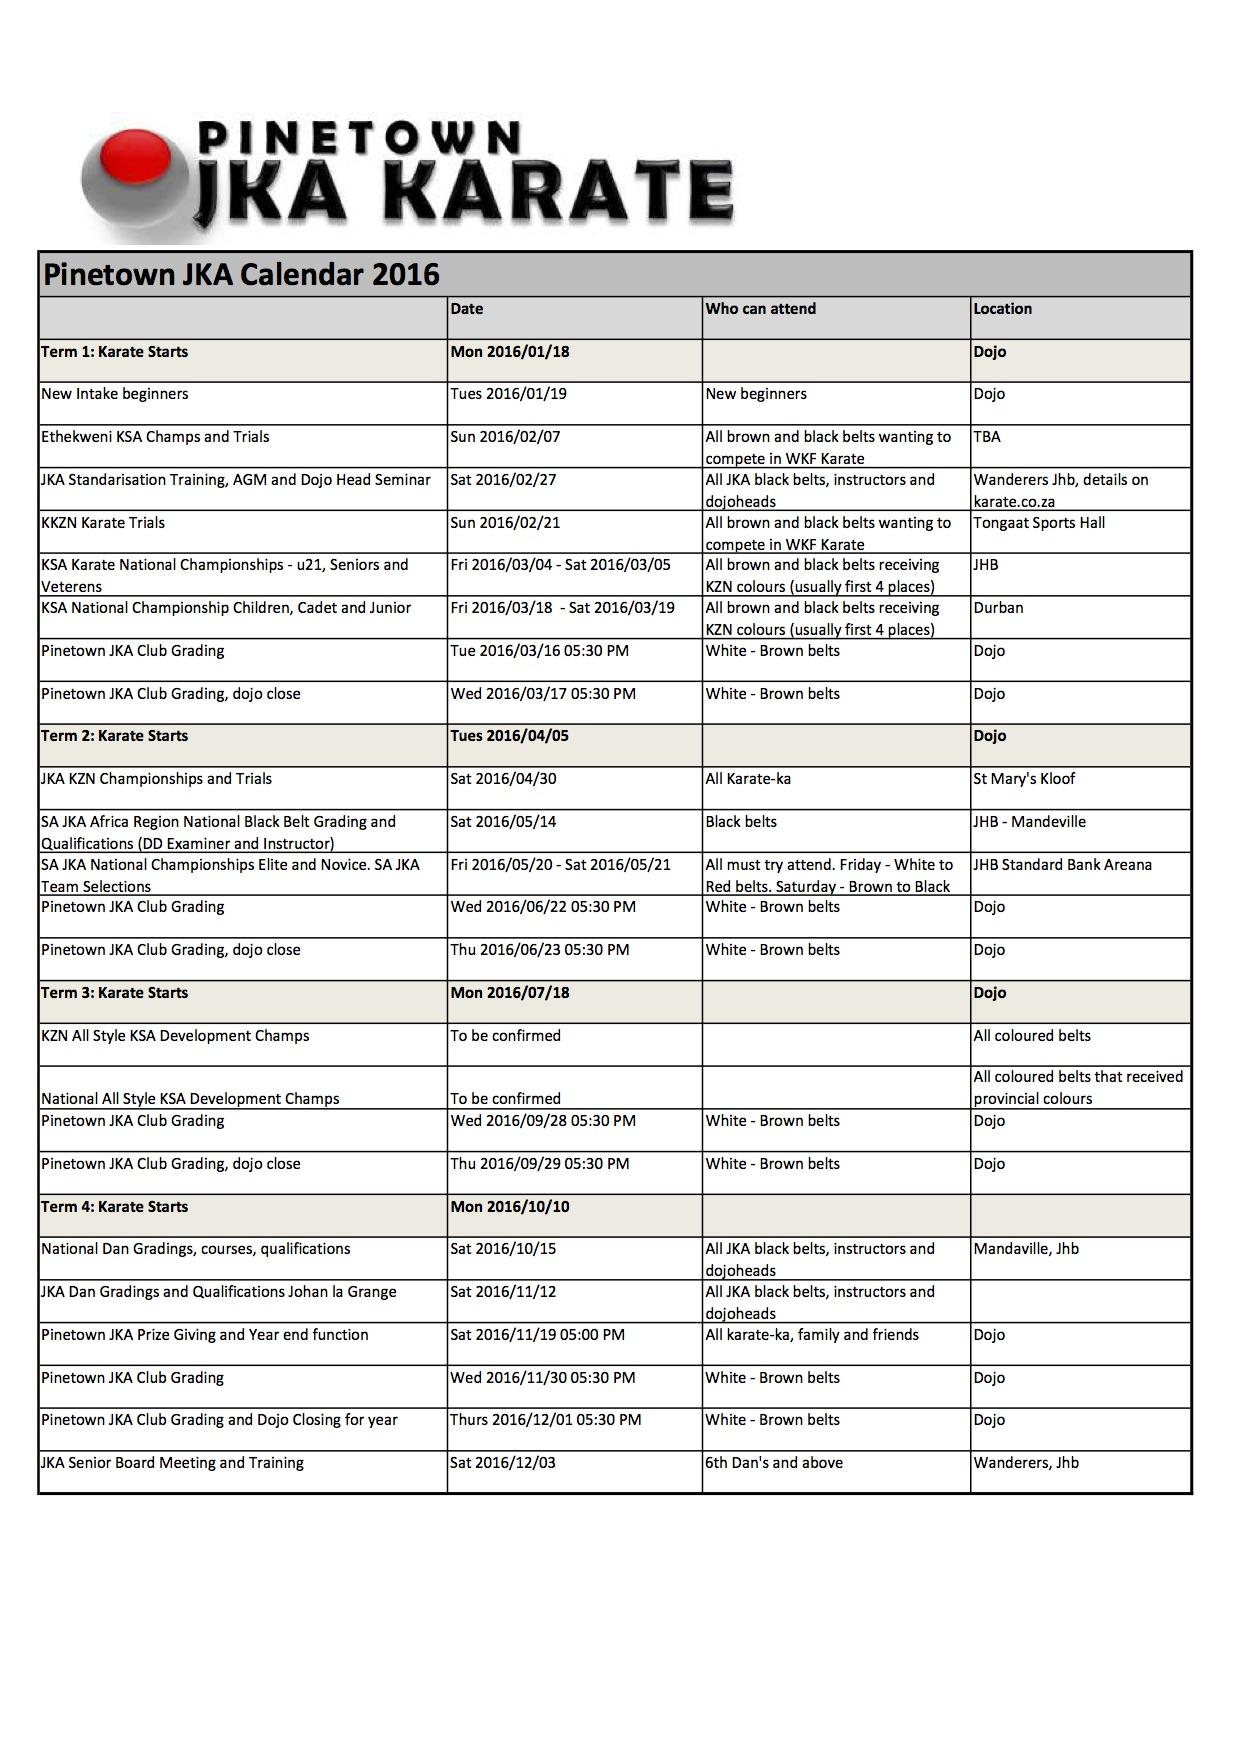 2016-pinetown-jka-karate-calendar-karin-prinsloo